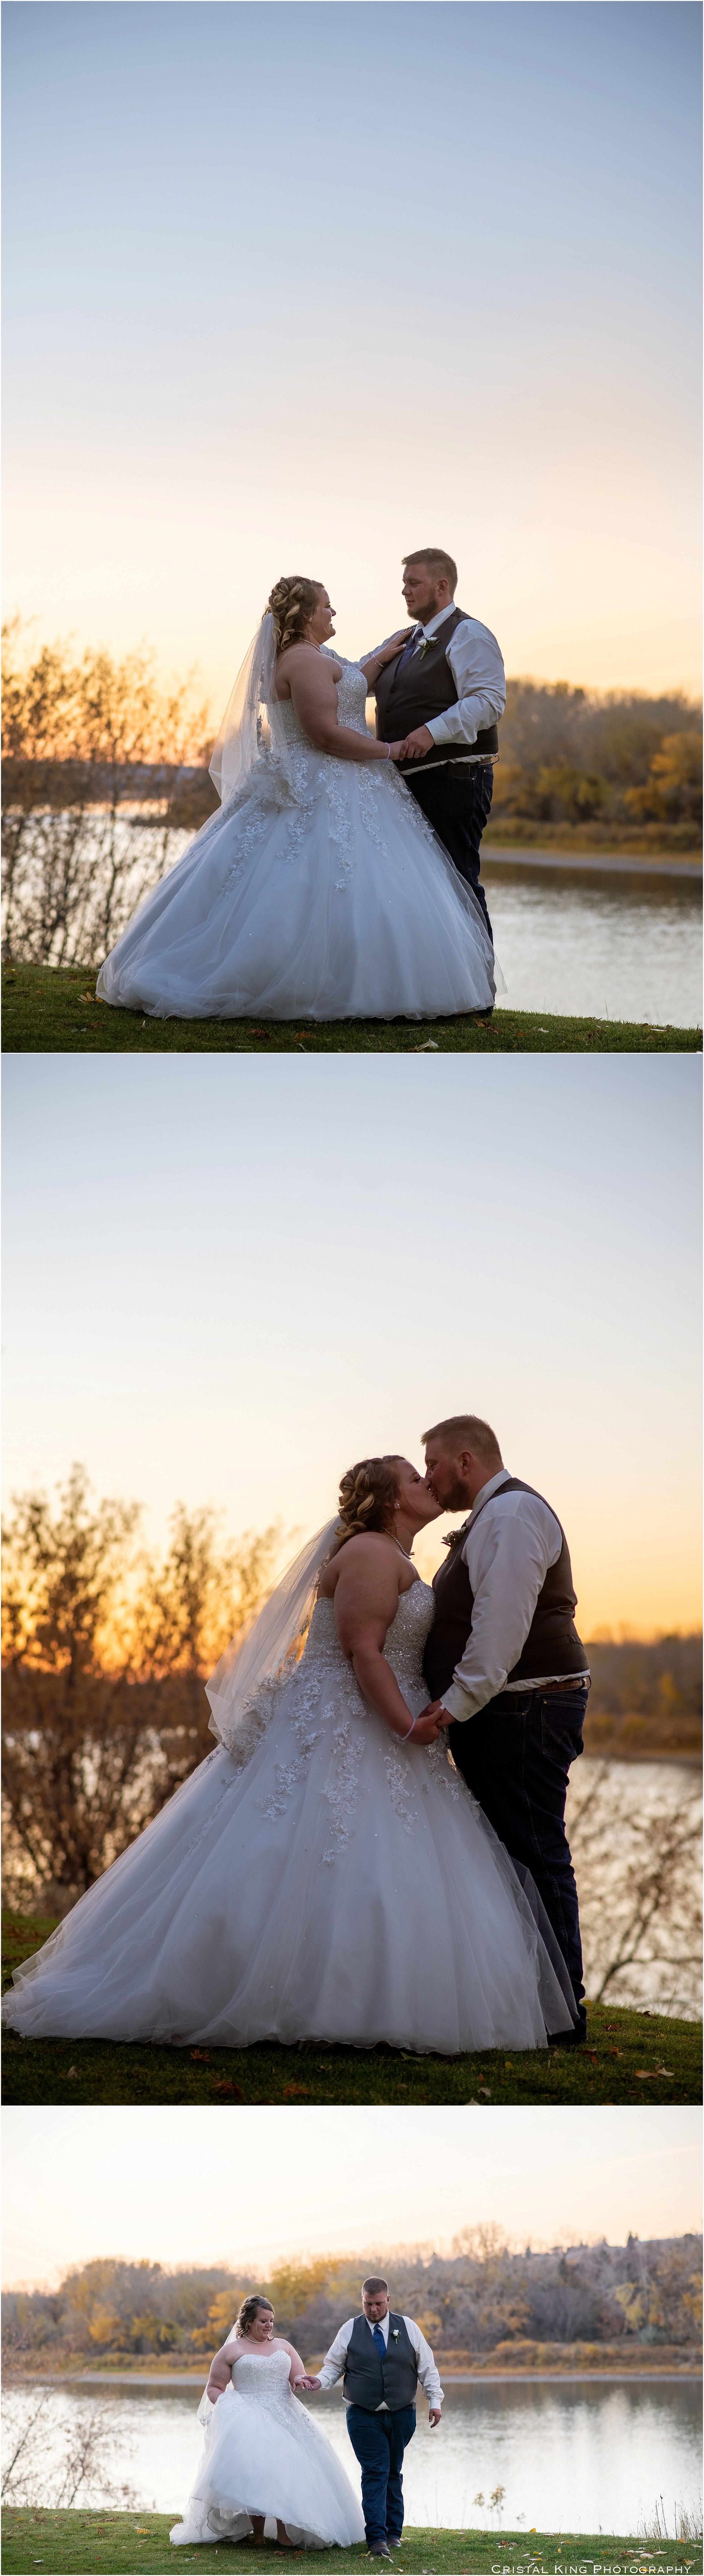 Tracy-Kyles-Wedding-181.jpg